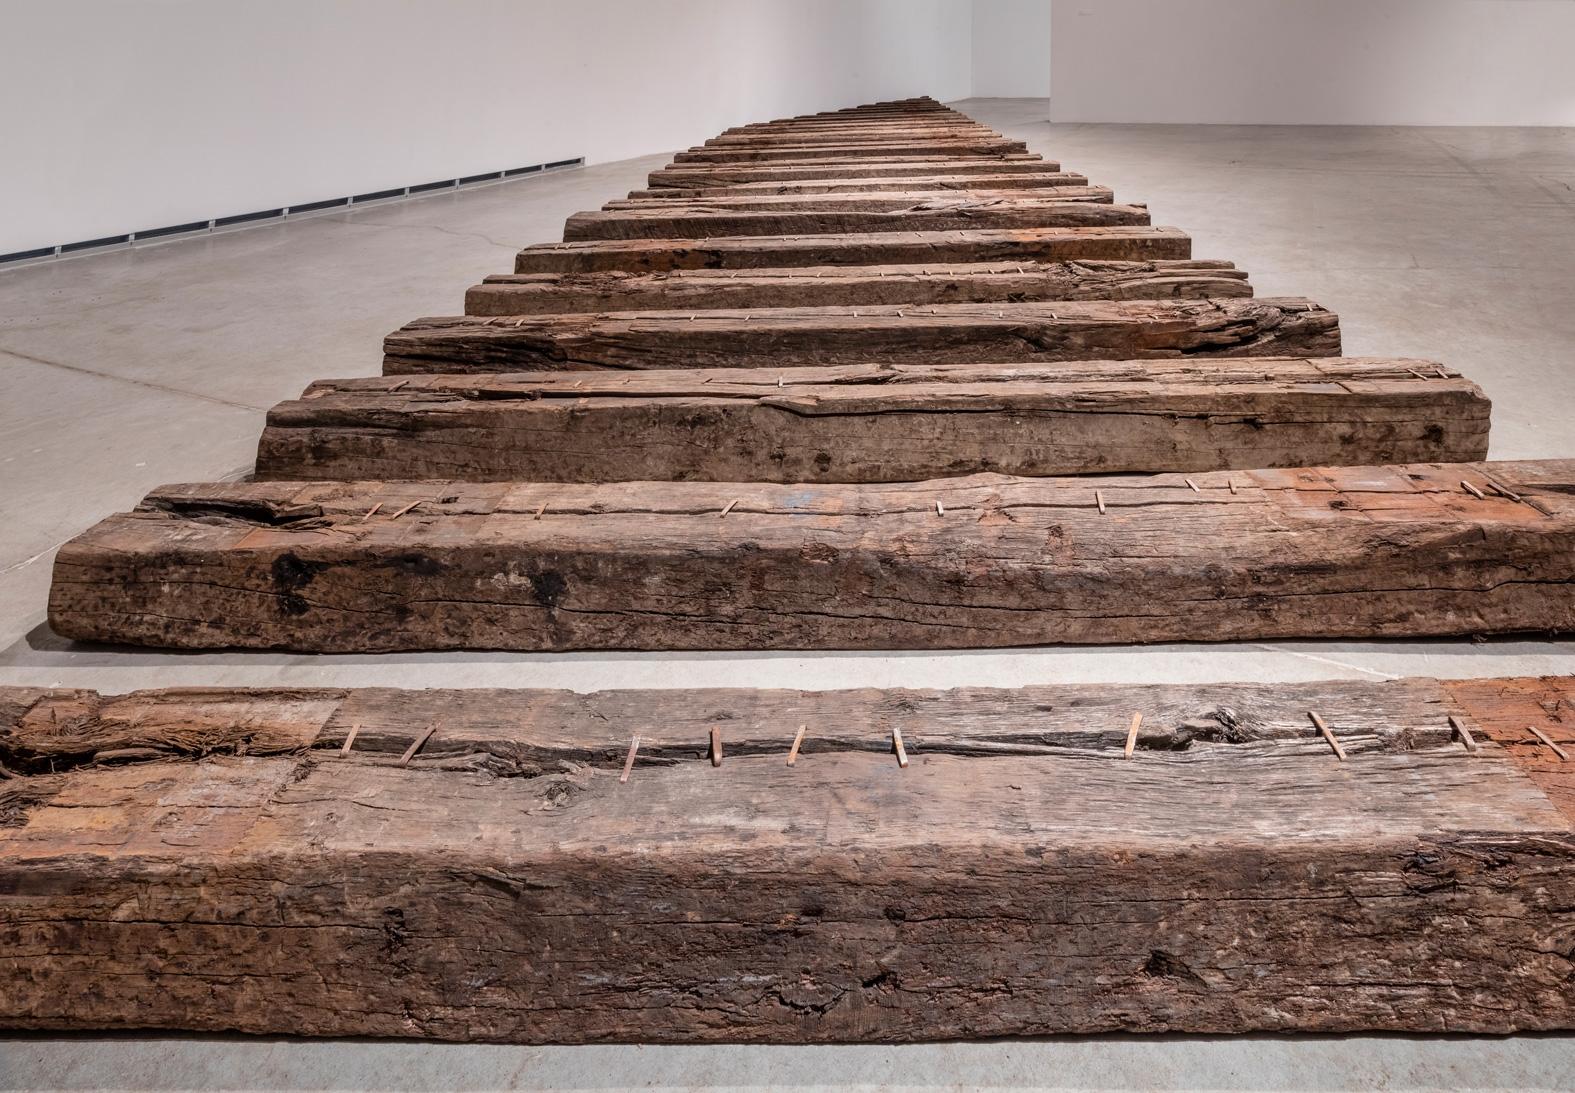 KADER ATTIA, Some Modernity's Footprints, 2018